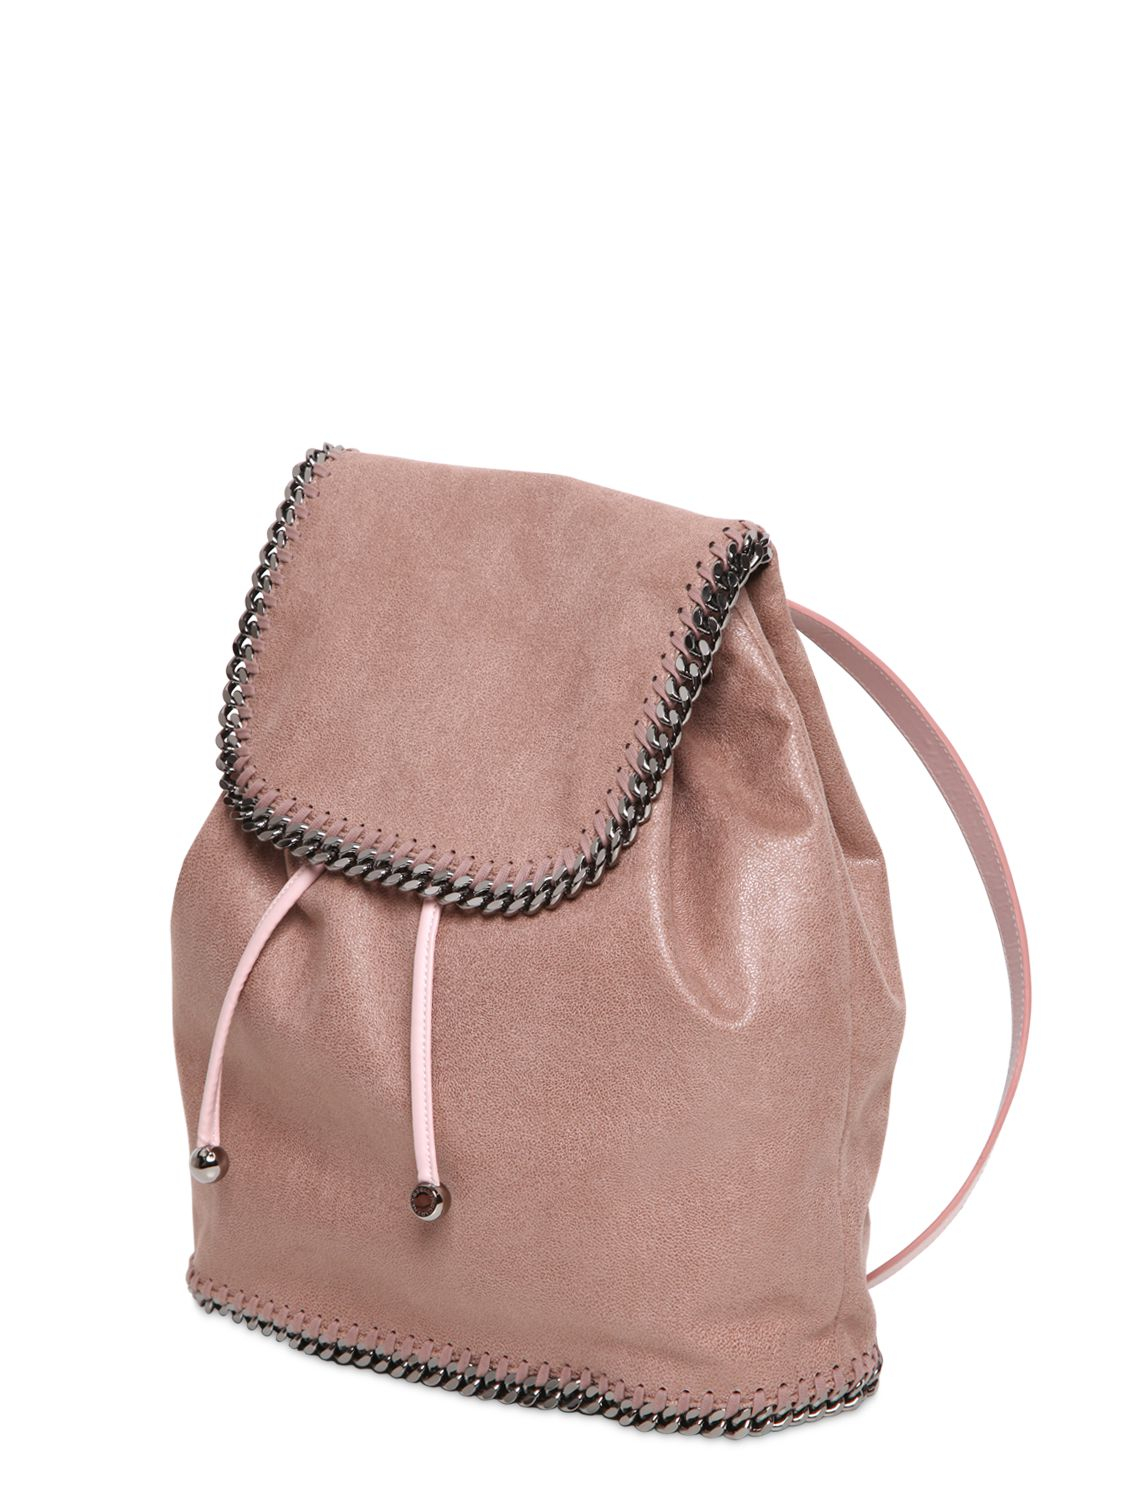 stella mccartney falabella shaggy faux deer backpack in pink lyst. Black Bedroom Furniture Sets. Home Design Ideas